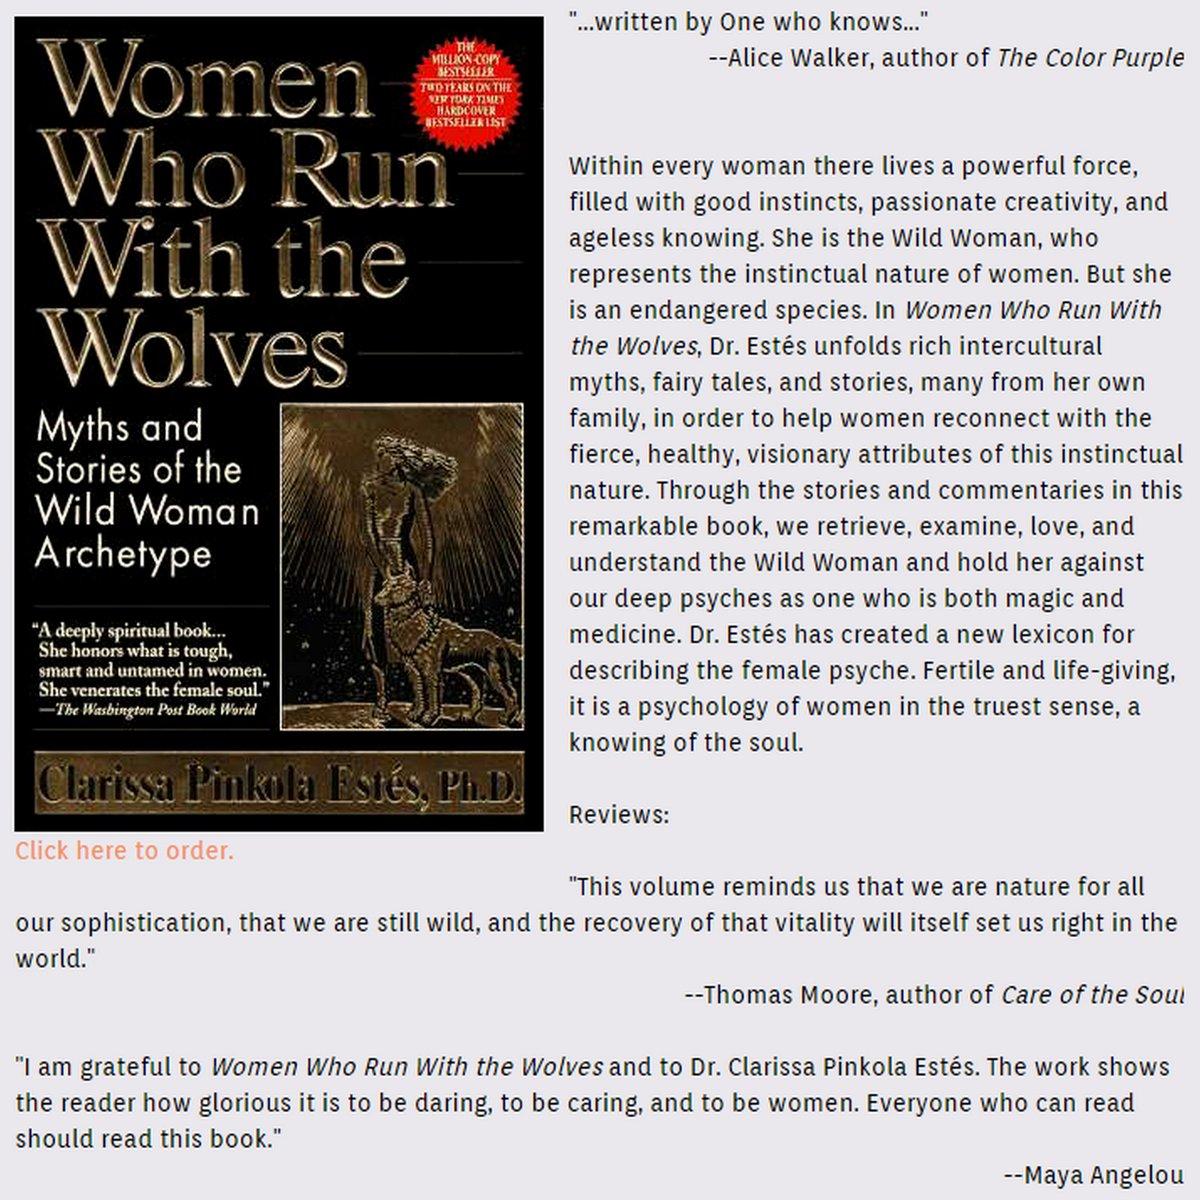 specghost on twitter women who run with the wolveshttpstcoywlhc8cxpz audiobooks books rightwolf book drclarissa pinkola